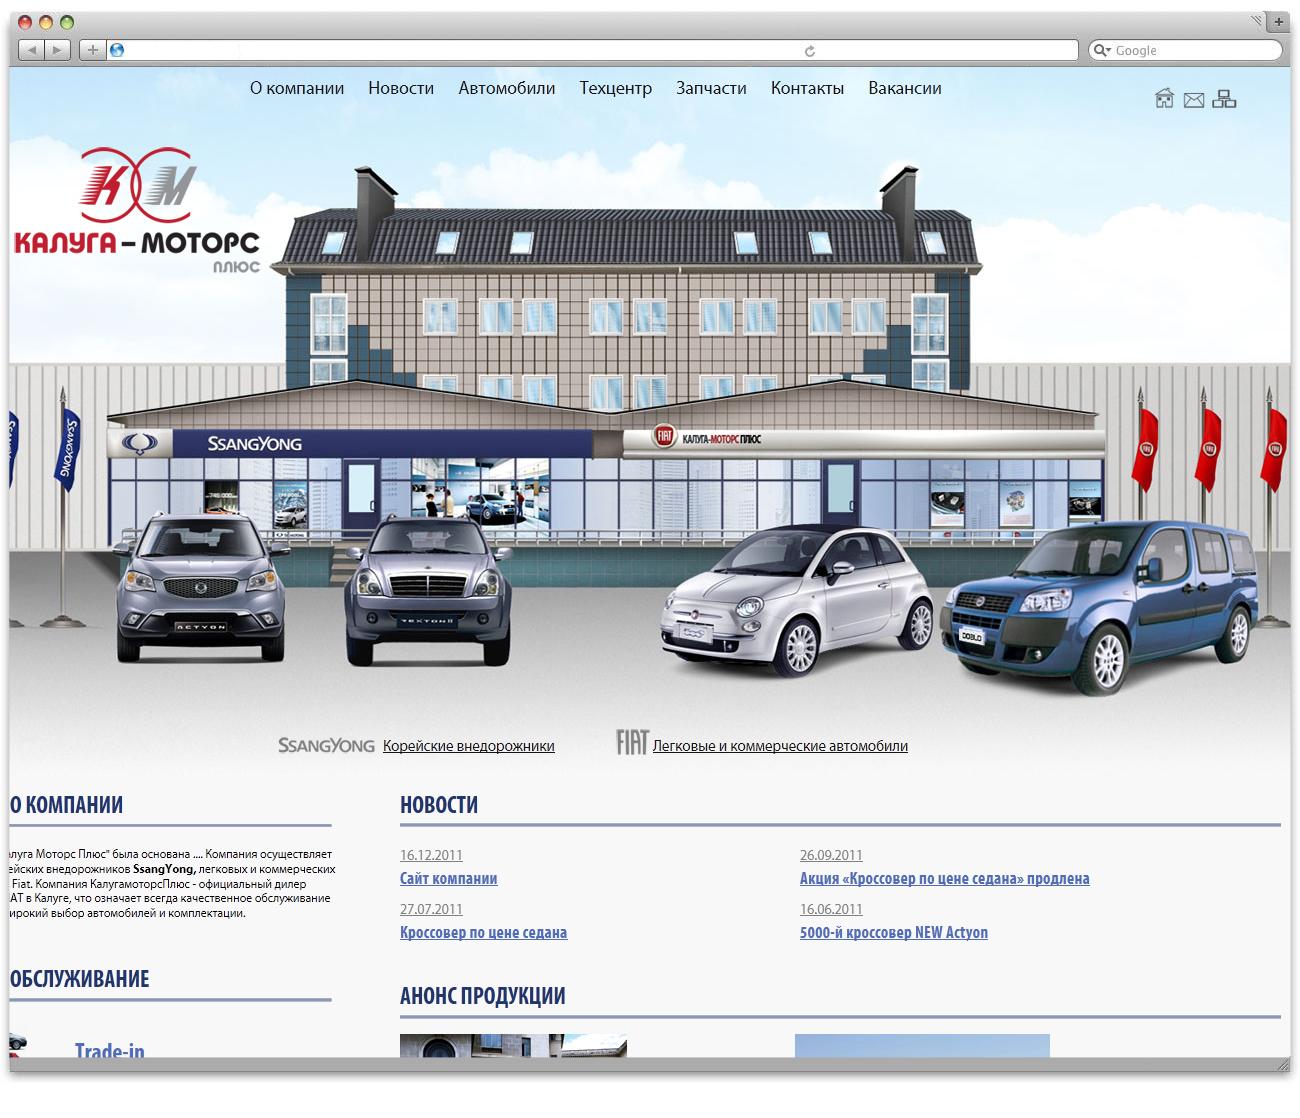 Адрес web сайта avto.artofweb.biz. Сайт автосалона, предлагающего